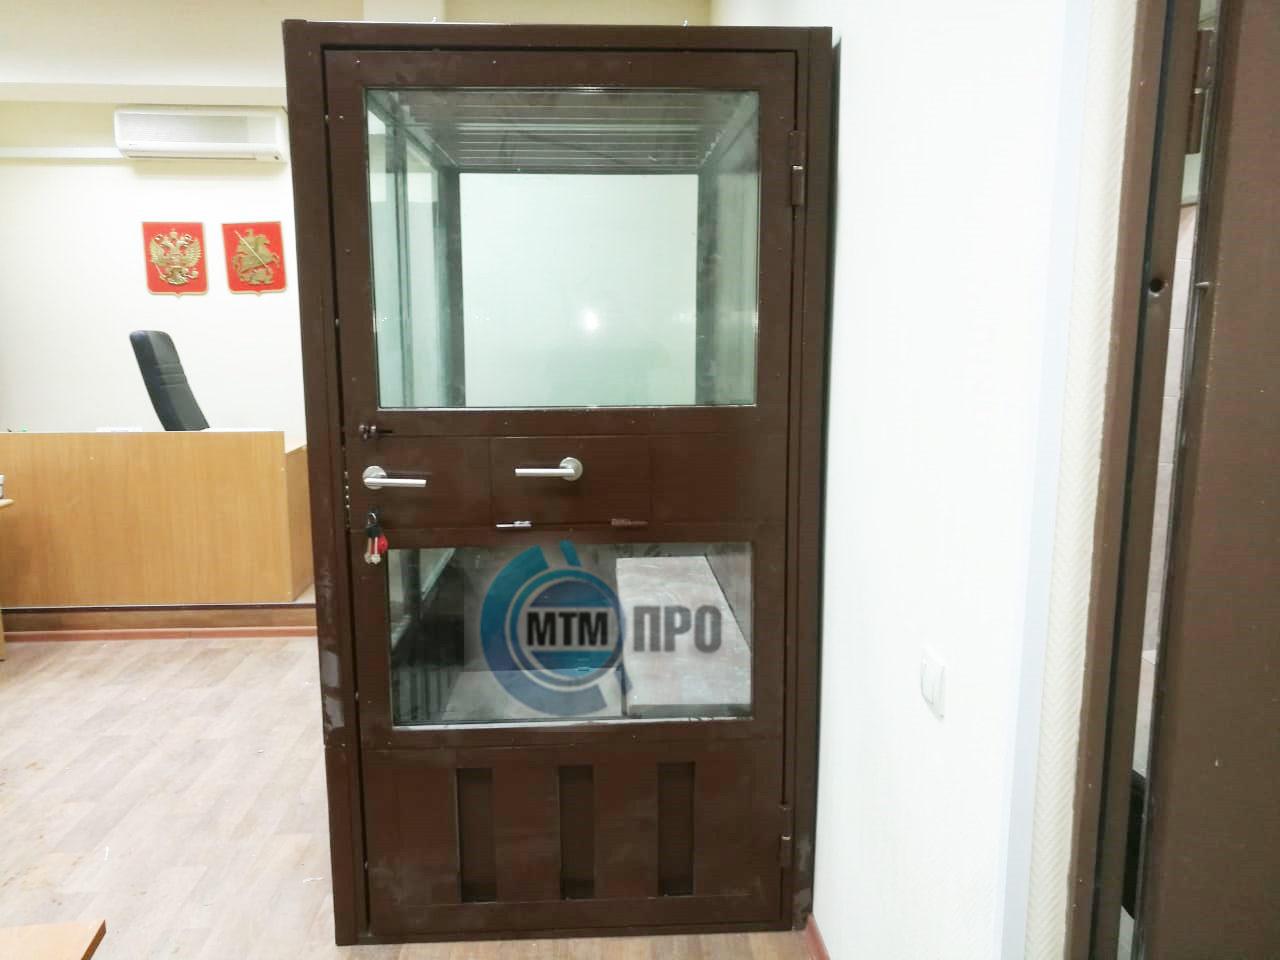 http://mtm-pro.ru/wp-content/uploads/2019/01/kabina-syd-3-1280x960.jpg